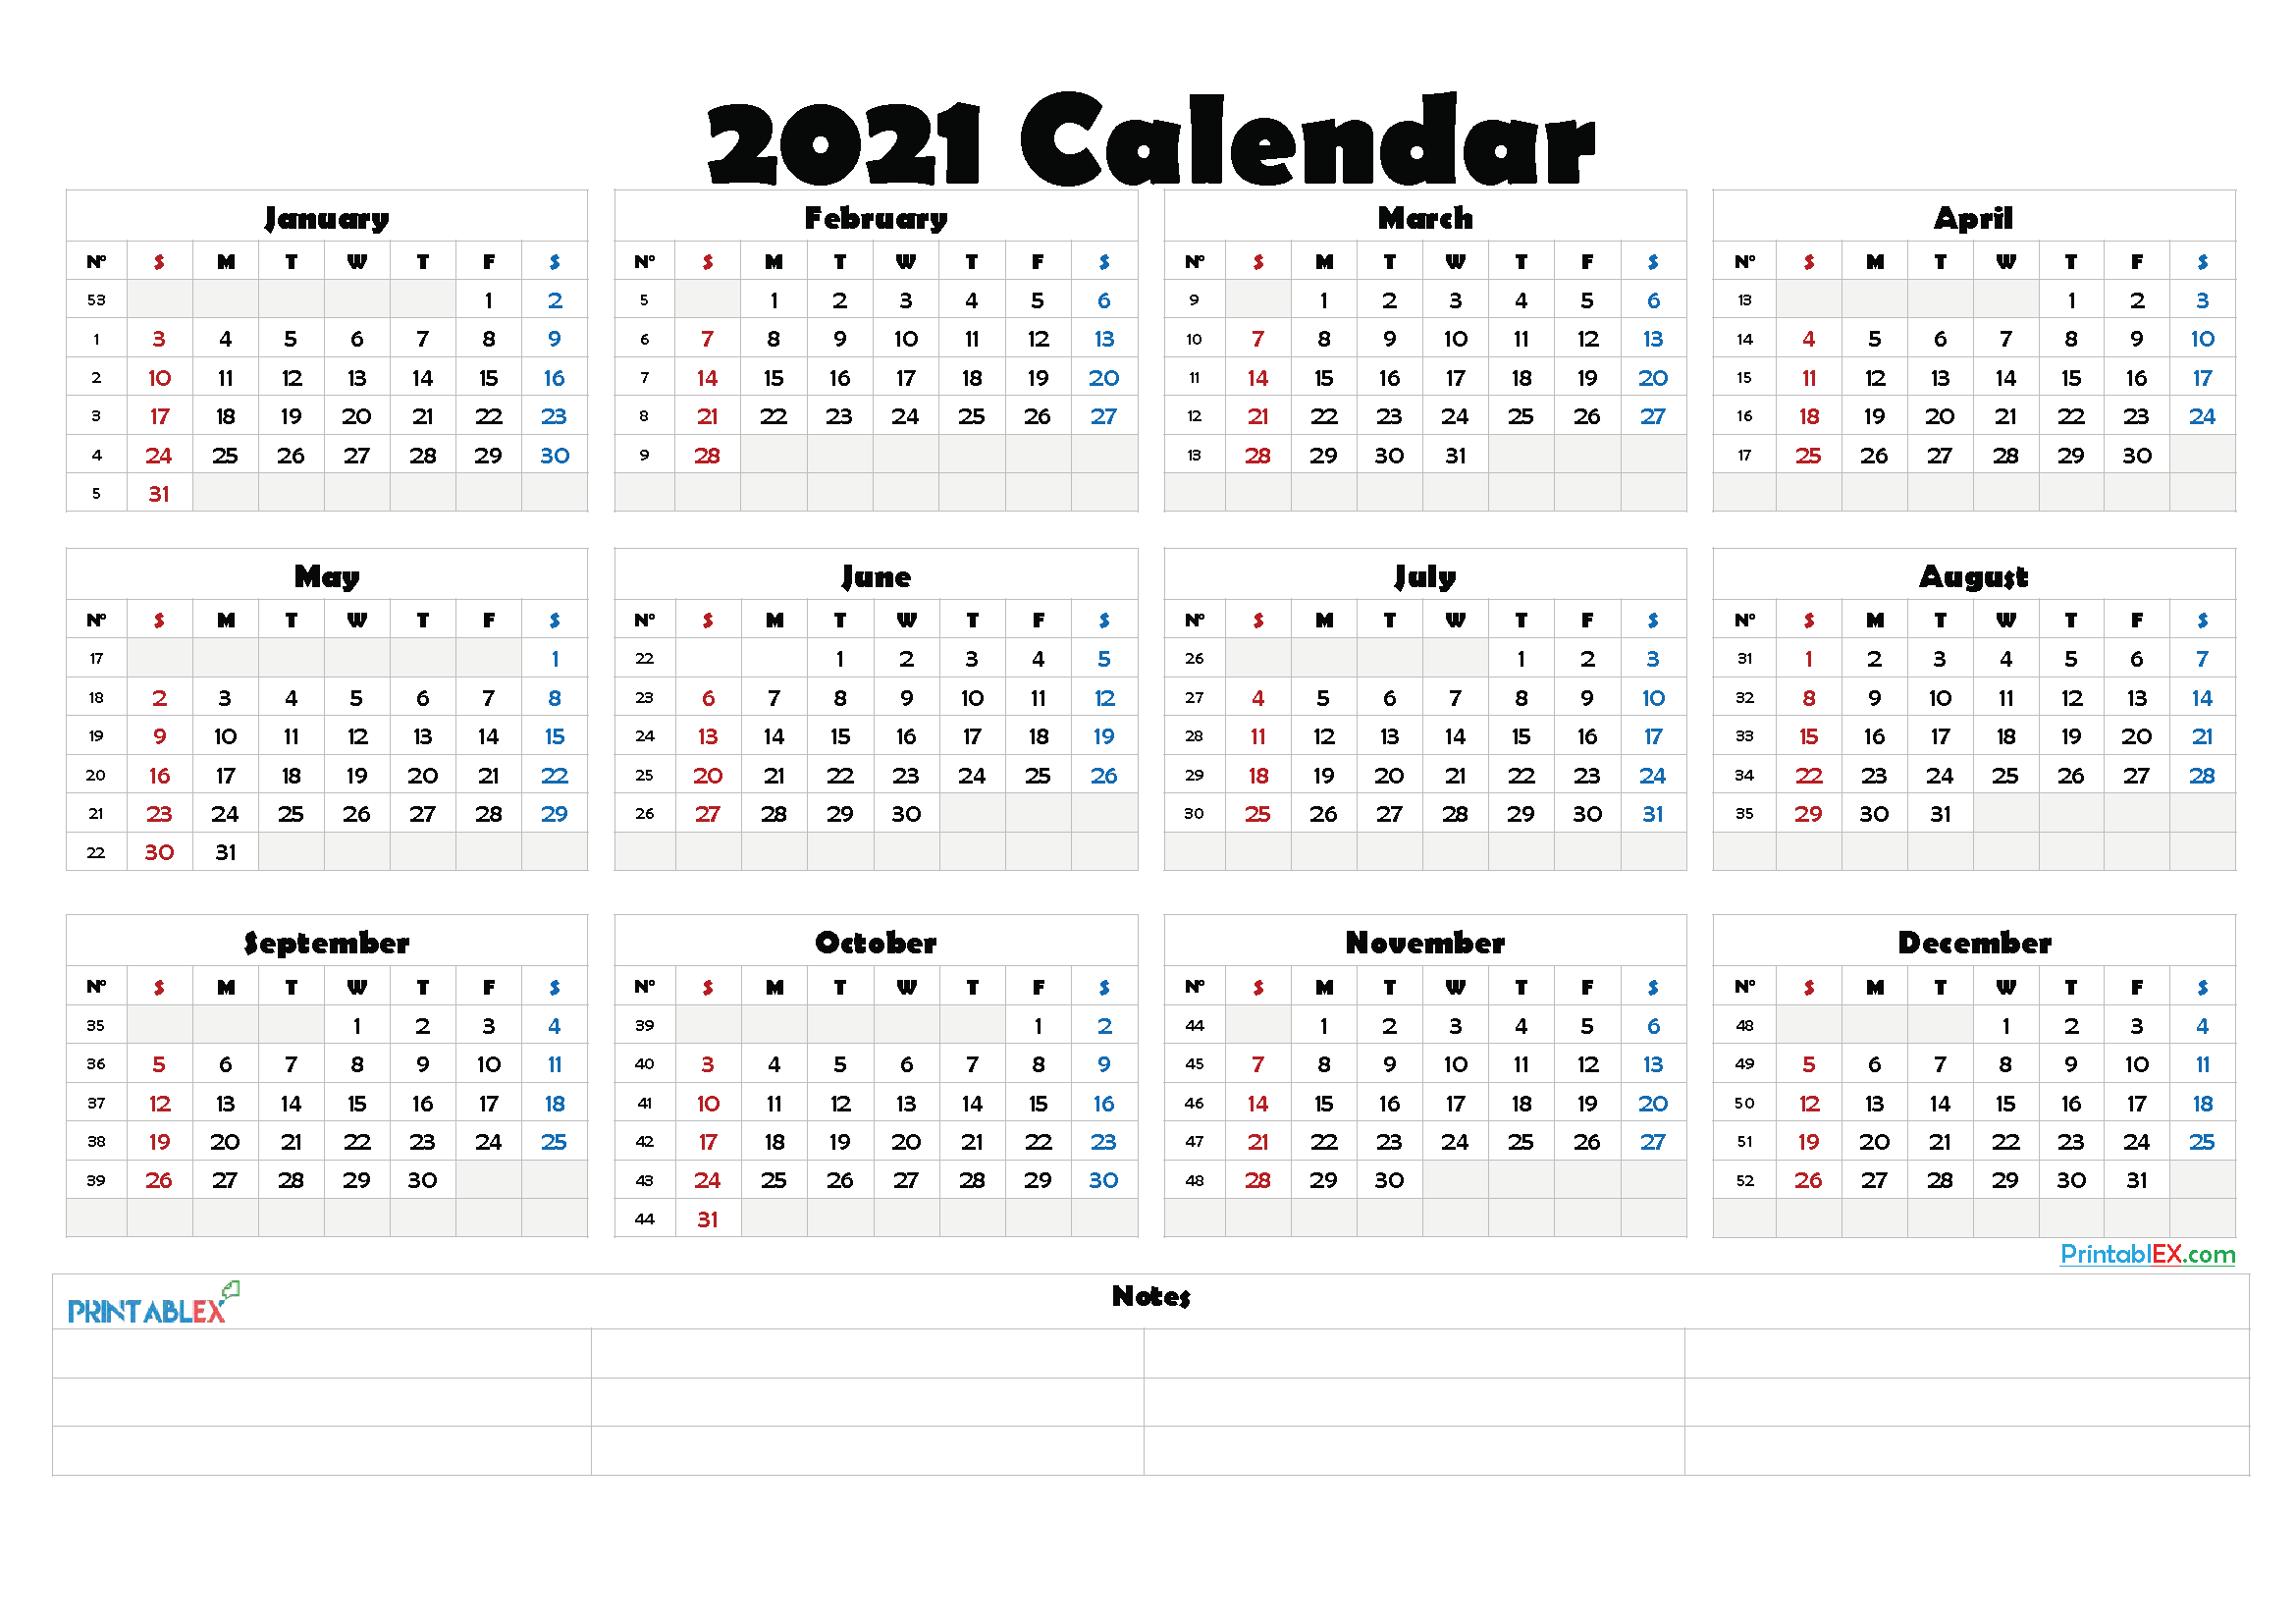 2021 Free Printable Yearly Calendar 21ytw155 in 2020